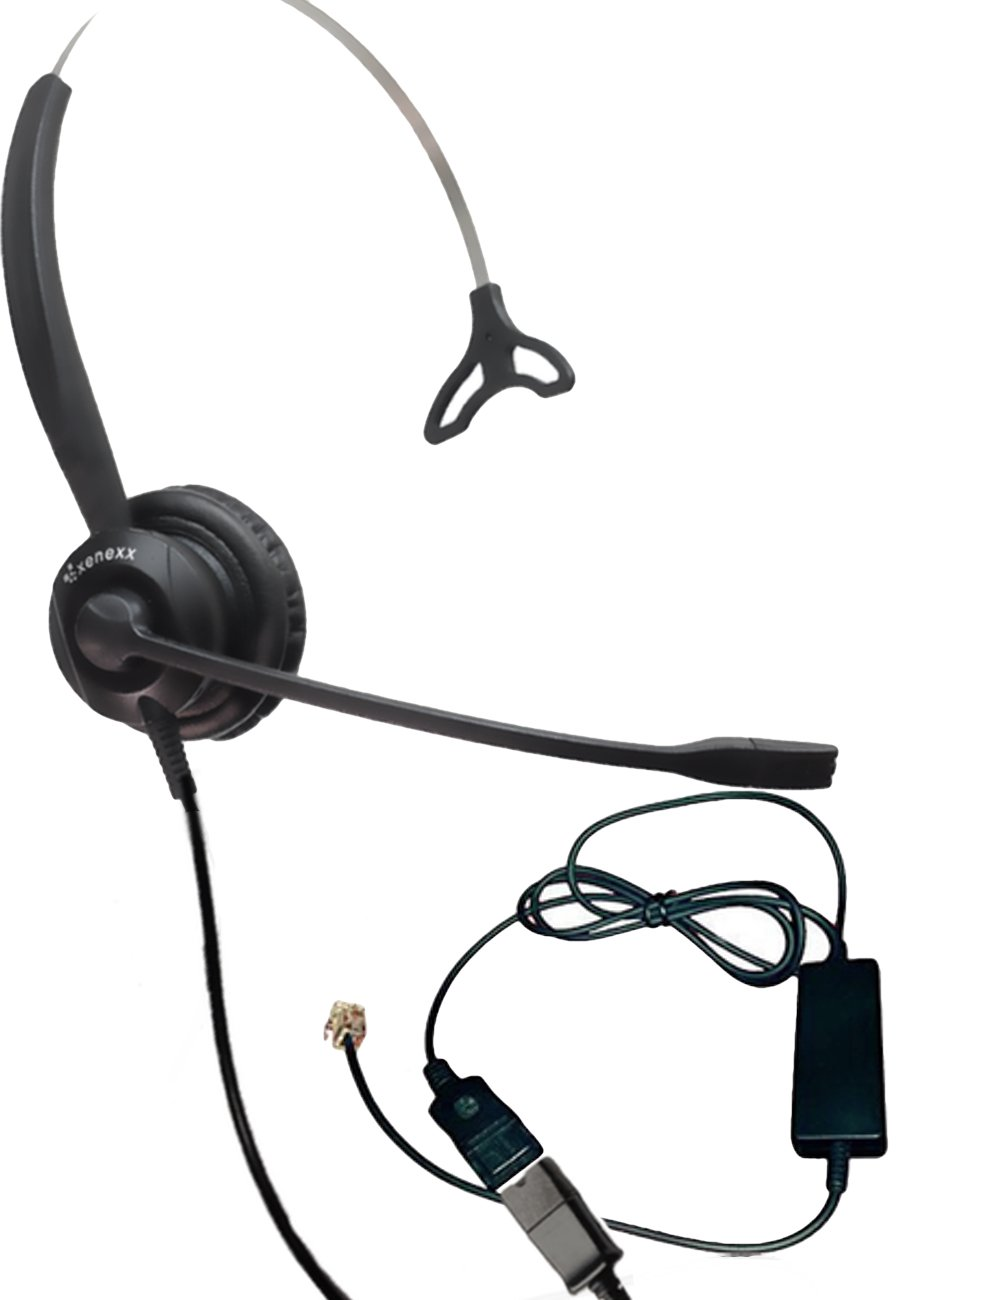 VoIP for RJ9 Phones with Headset Port Mitel Nortel Allworx NEC XS ...